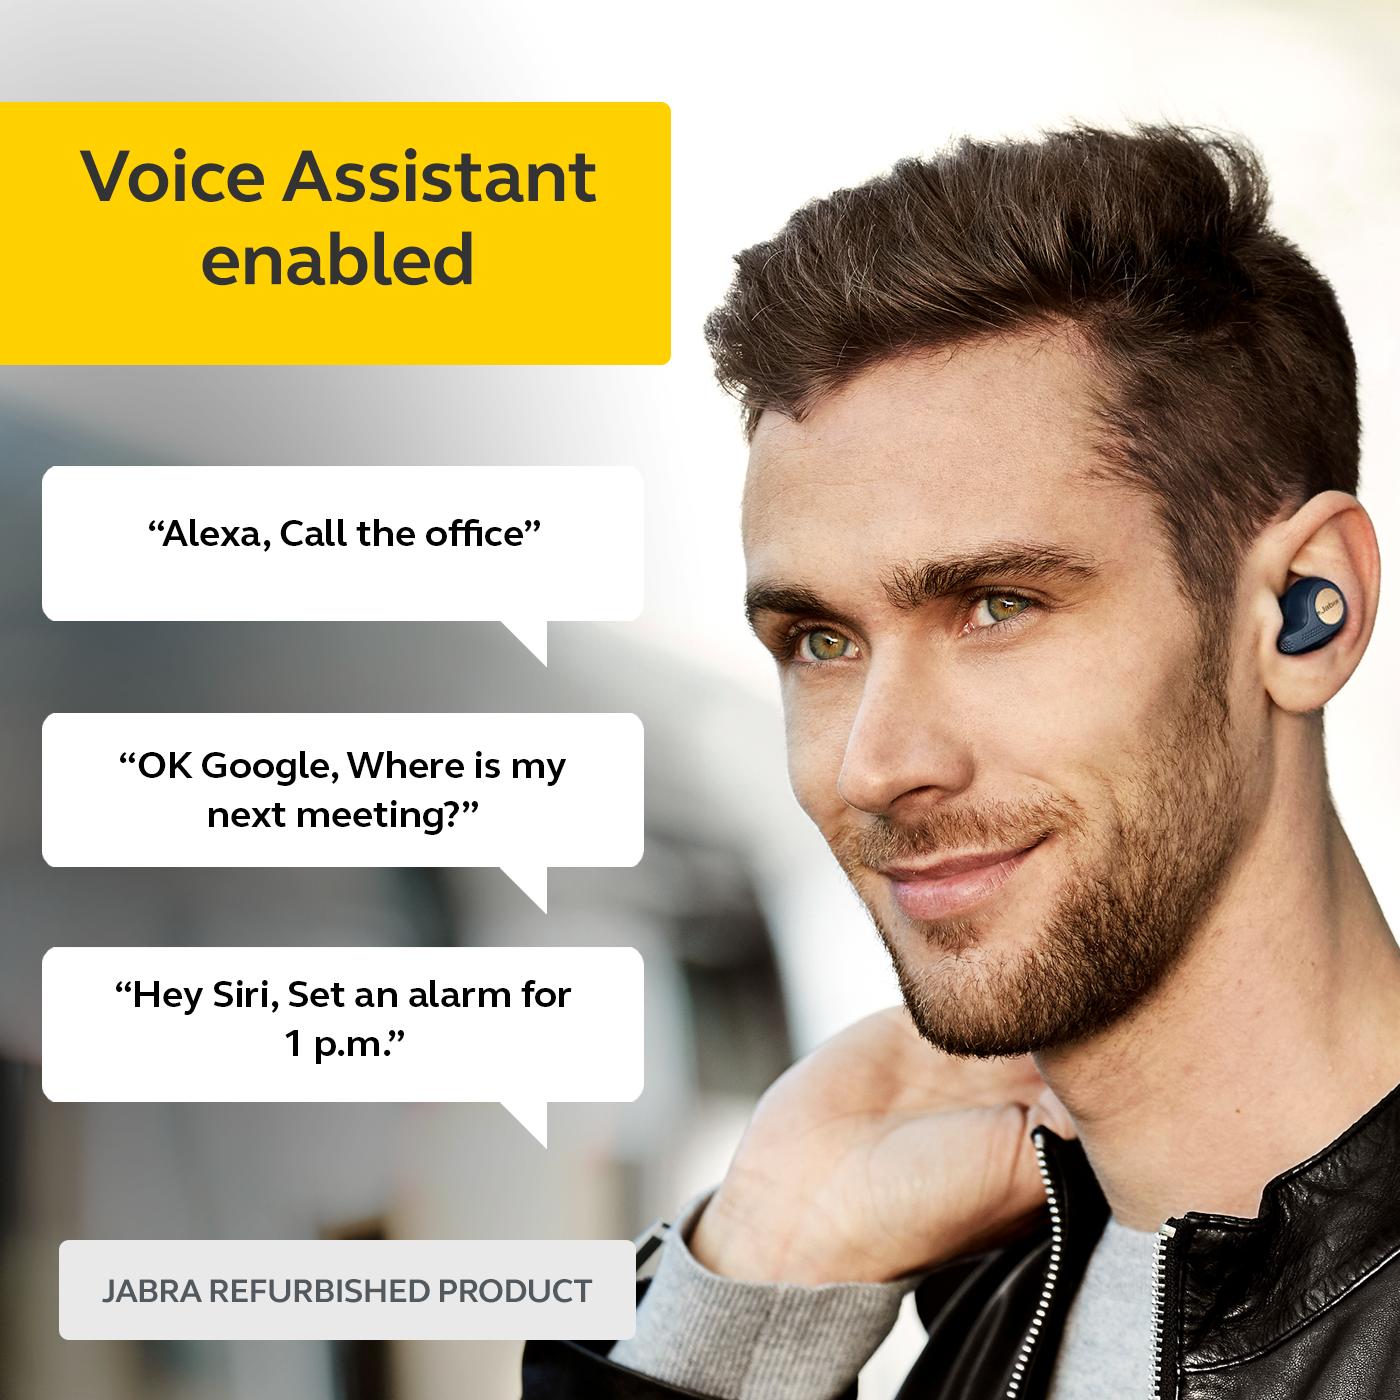 Jabra-Elite-Active-65t-True-Wireless-Earbuds-Manufacturer-Refurbished thumbnail 18